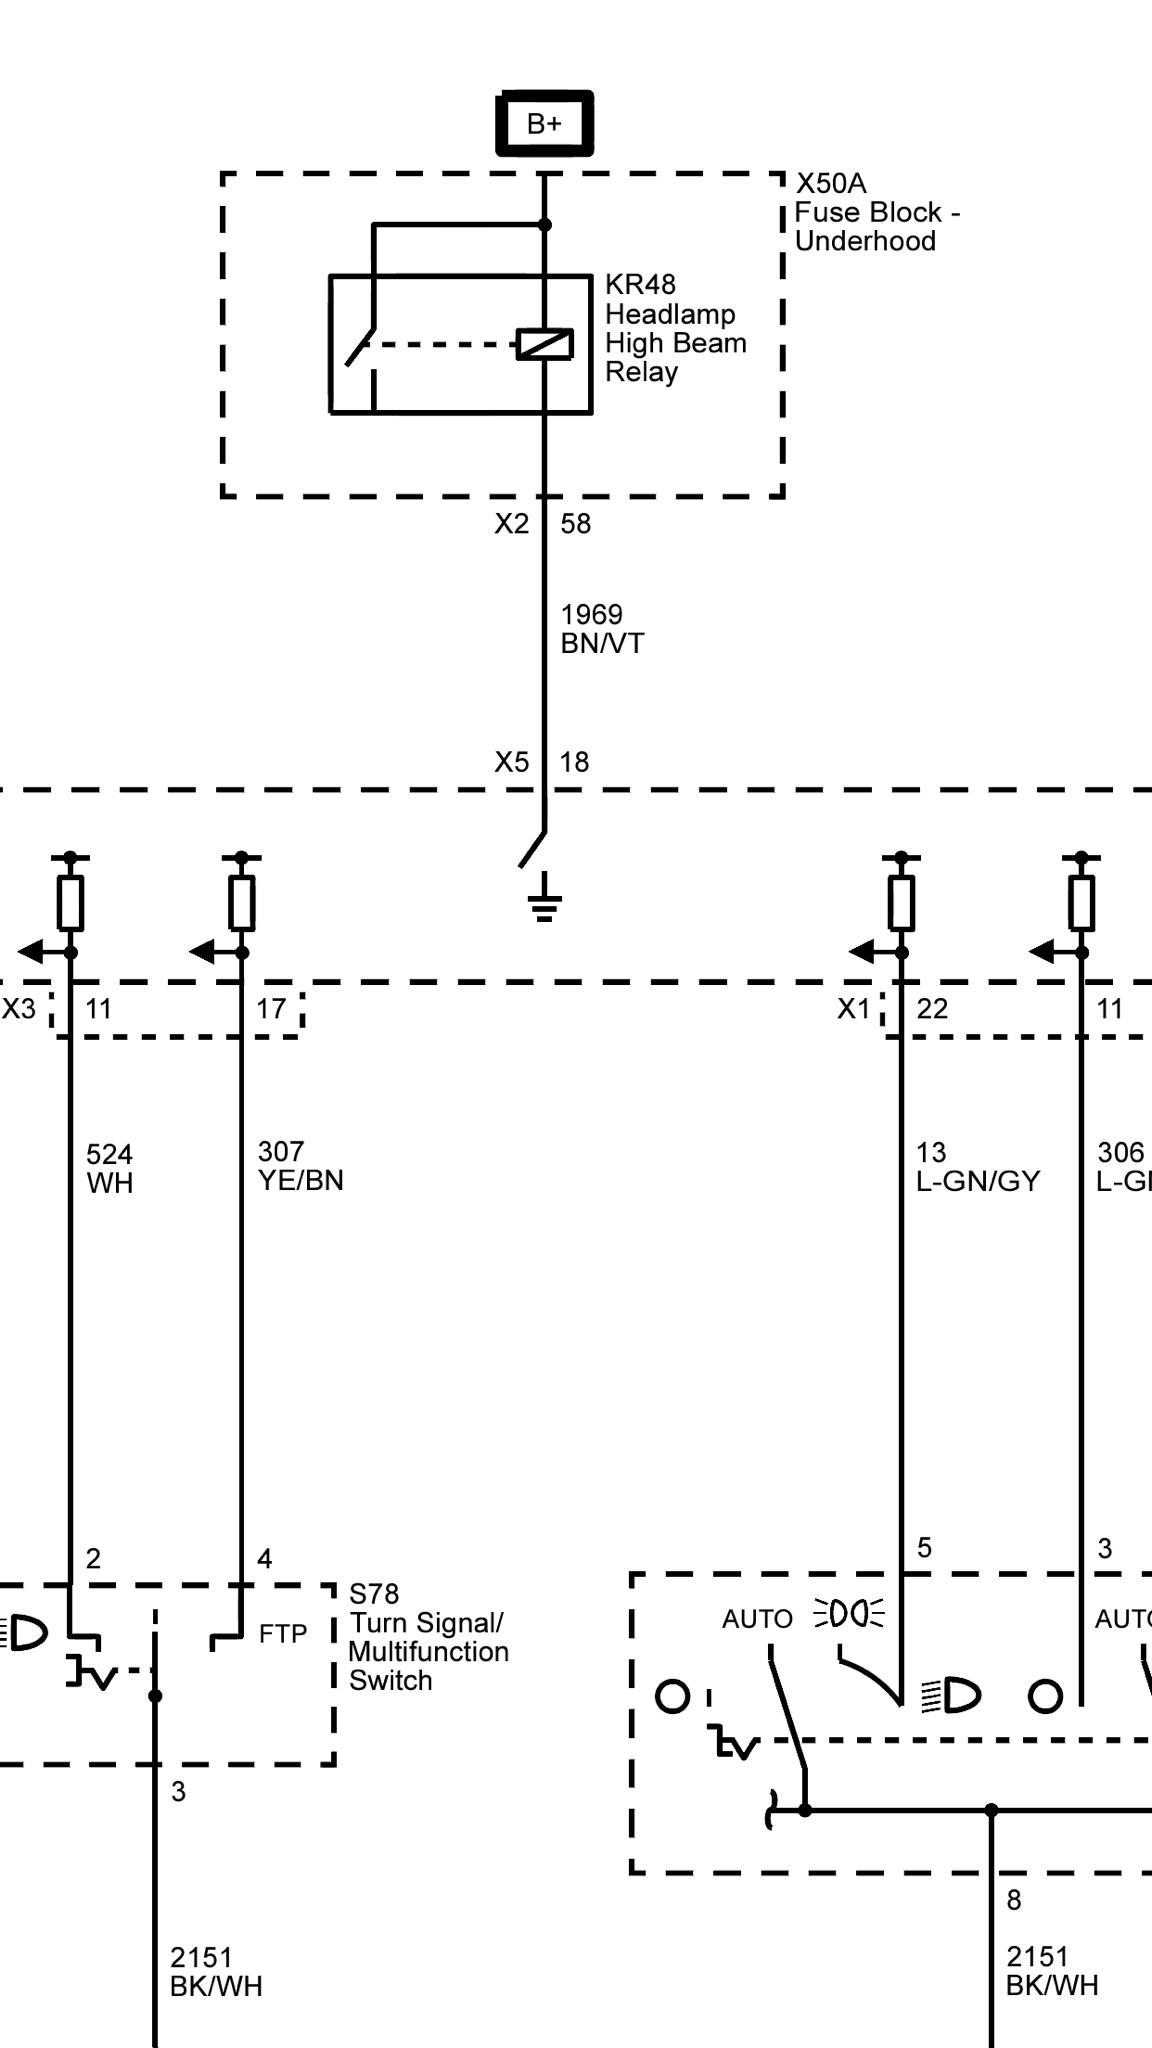 Chevrolet Colorado Fog Light Relay Wiring Diagram - Wiring Diagram